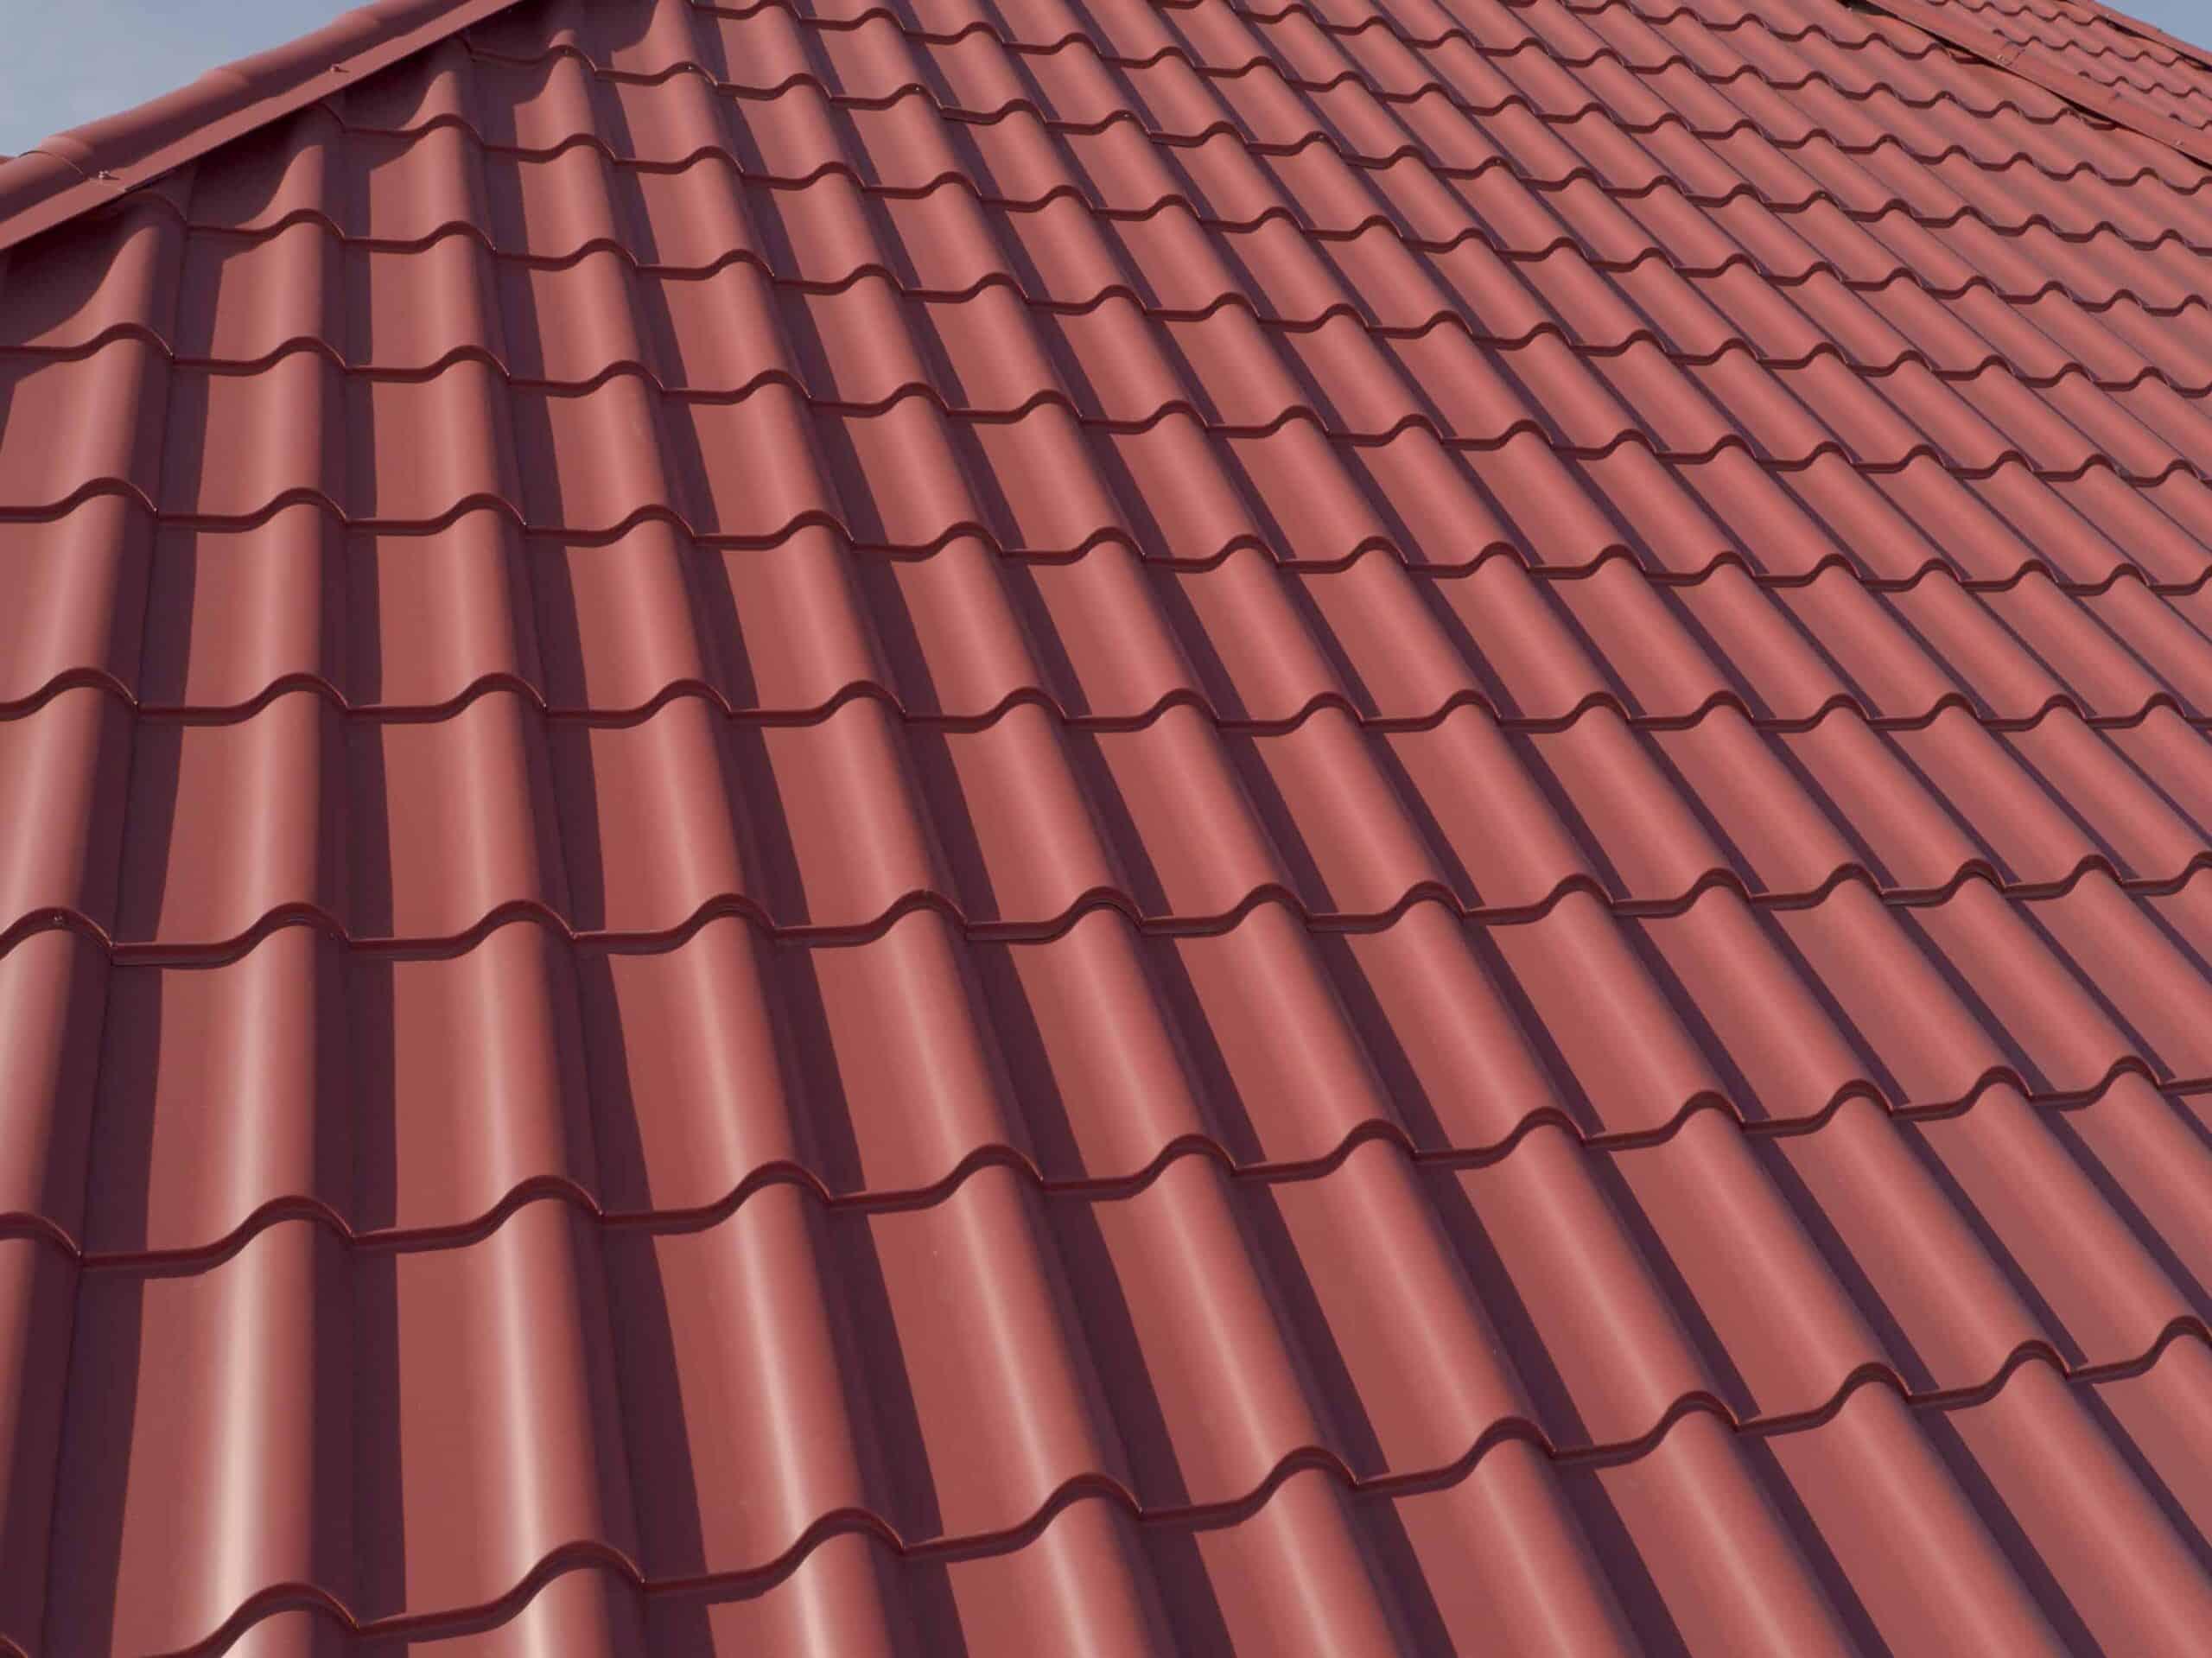 South Barrington, IL Tile Red Mediterranean Tile Metal Roof